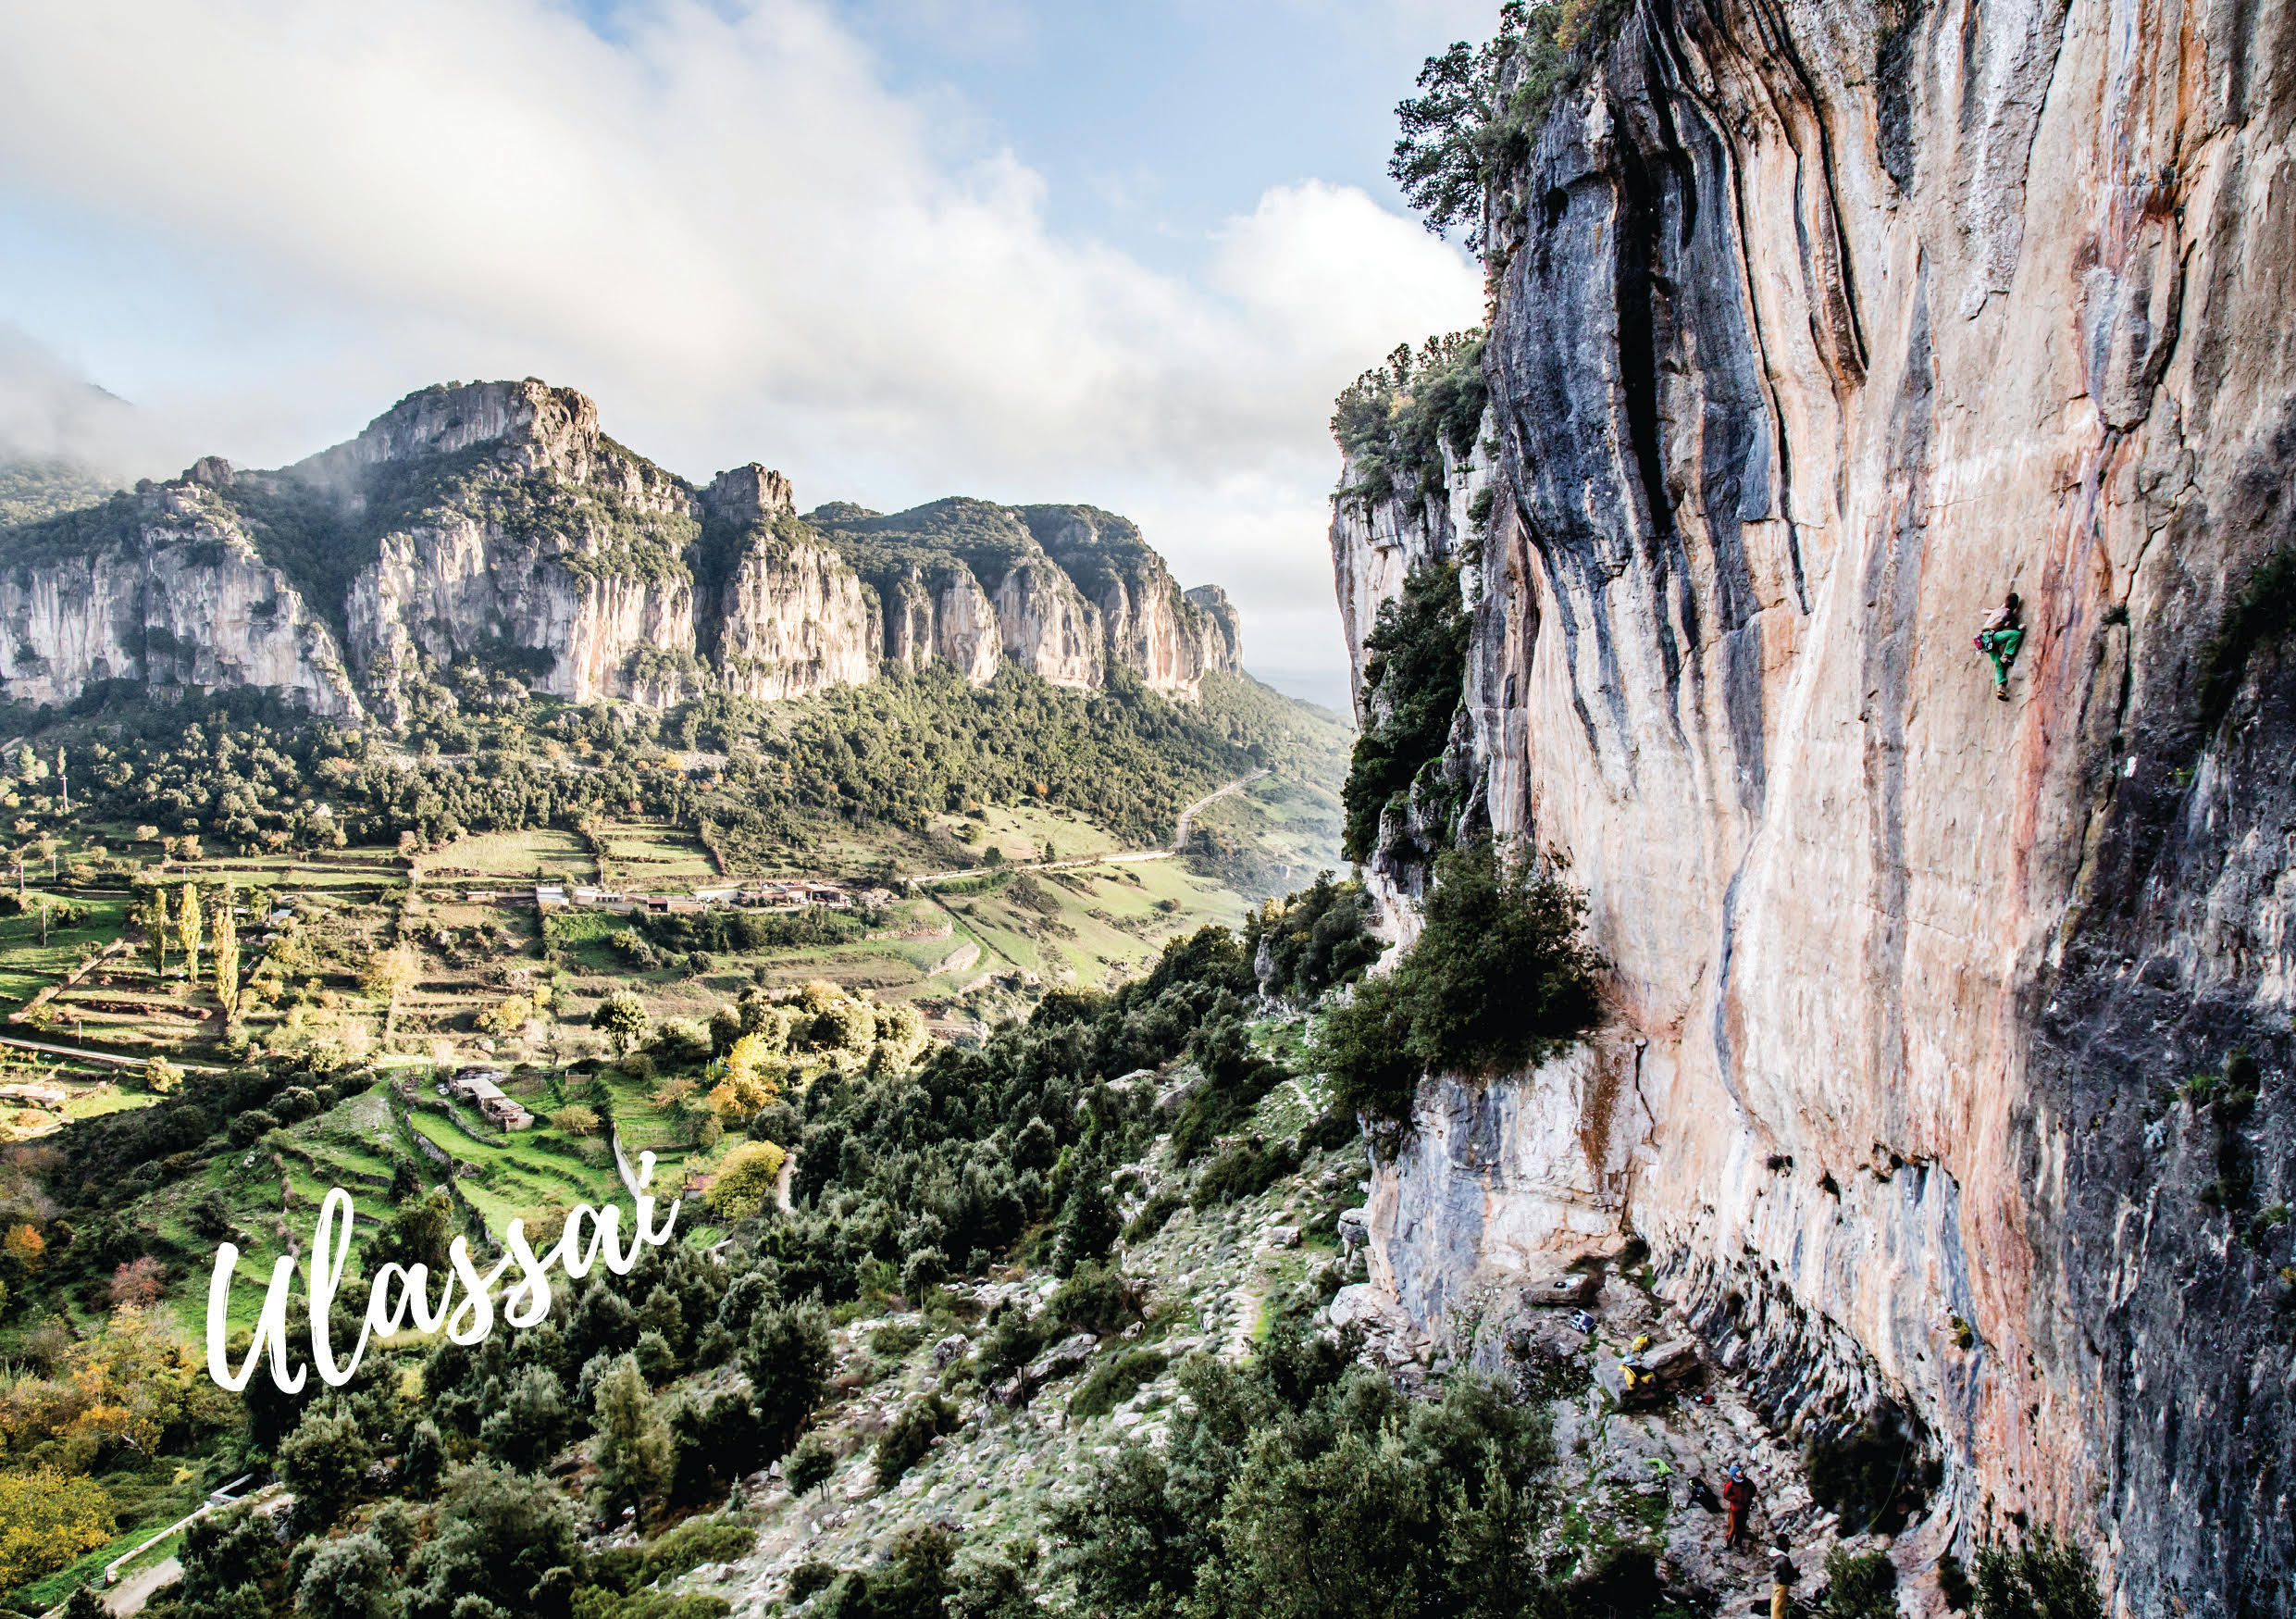 climbing guidebook of ulassai